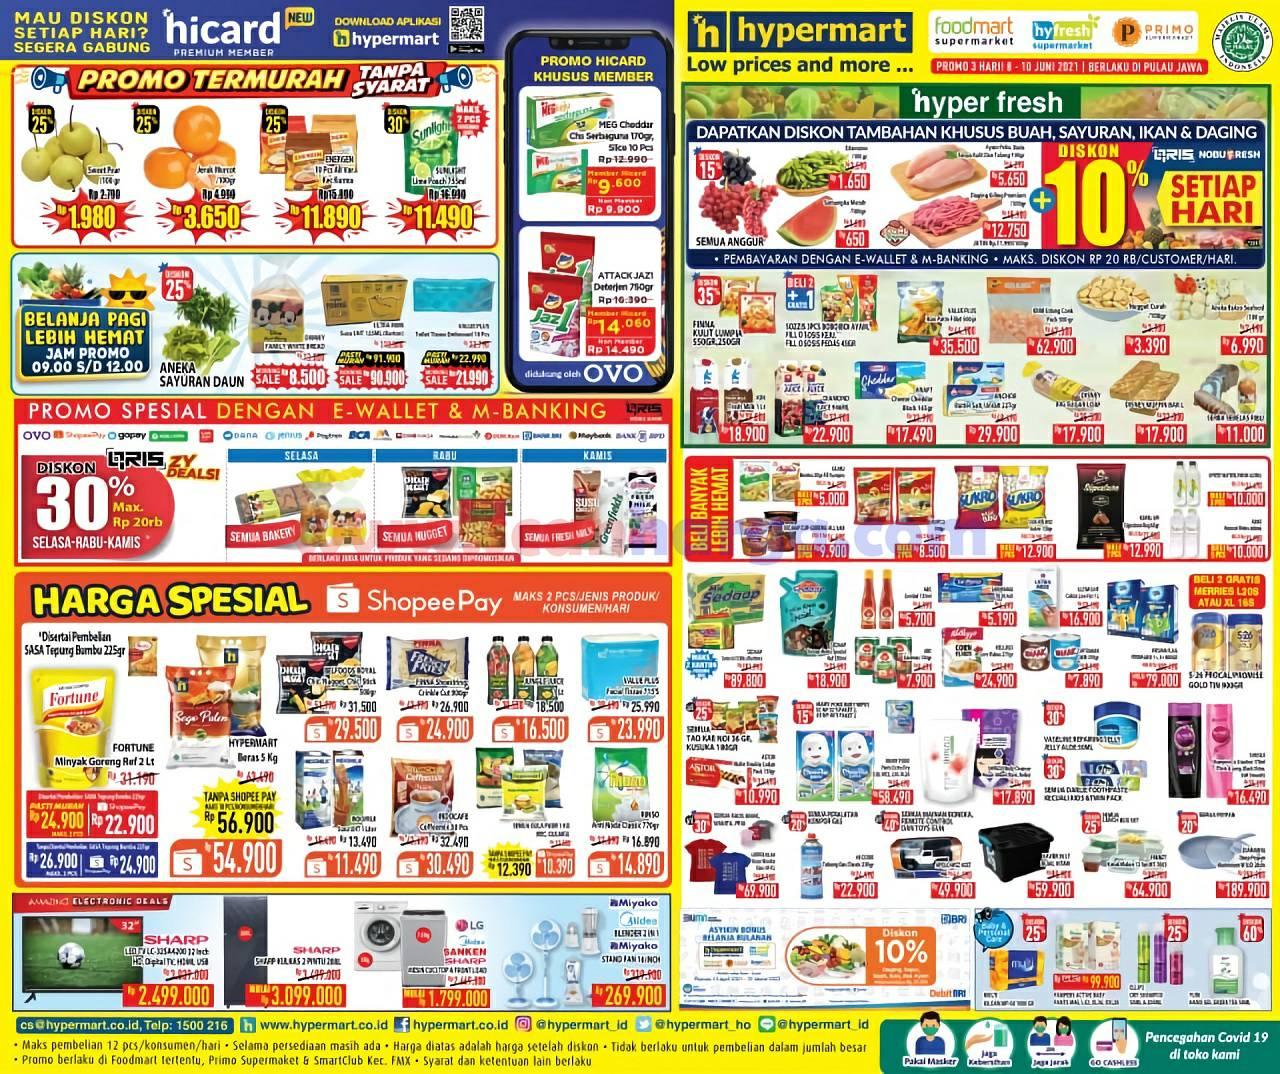 Katalog Promo Hypermart Weekday Terbaru 8 - 10 Juni 2021